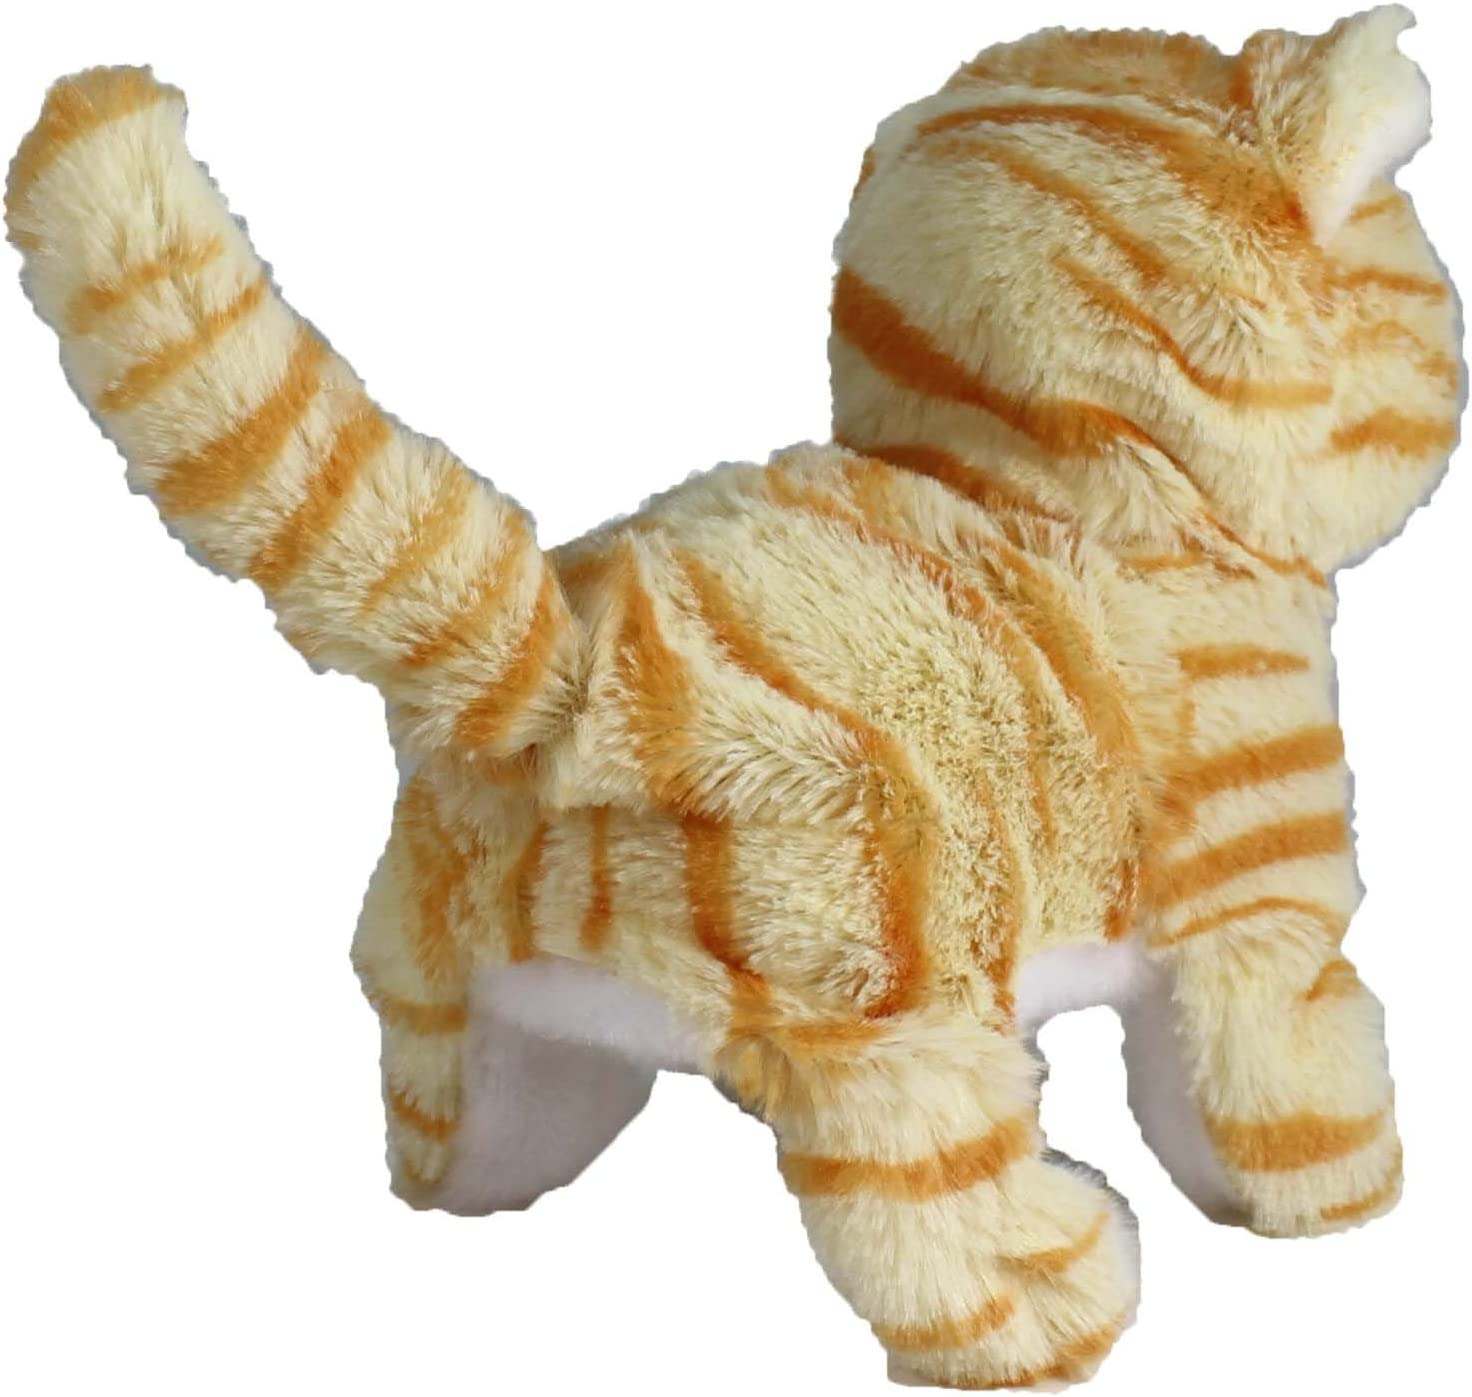 Orange Striped Casanova The Mechanical Kitten